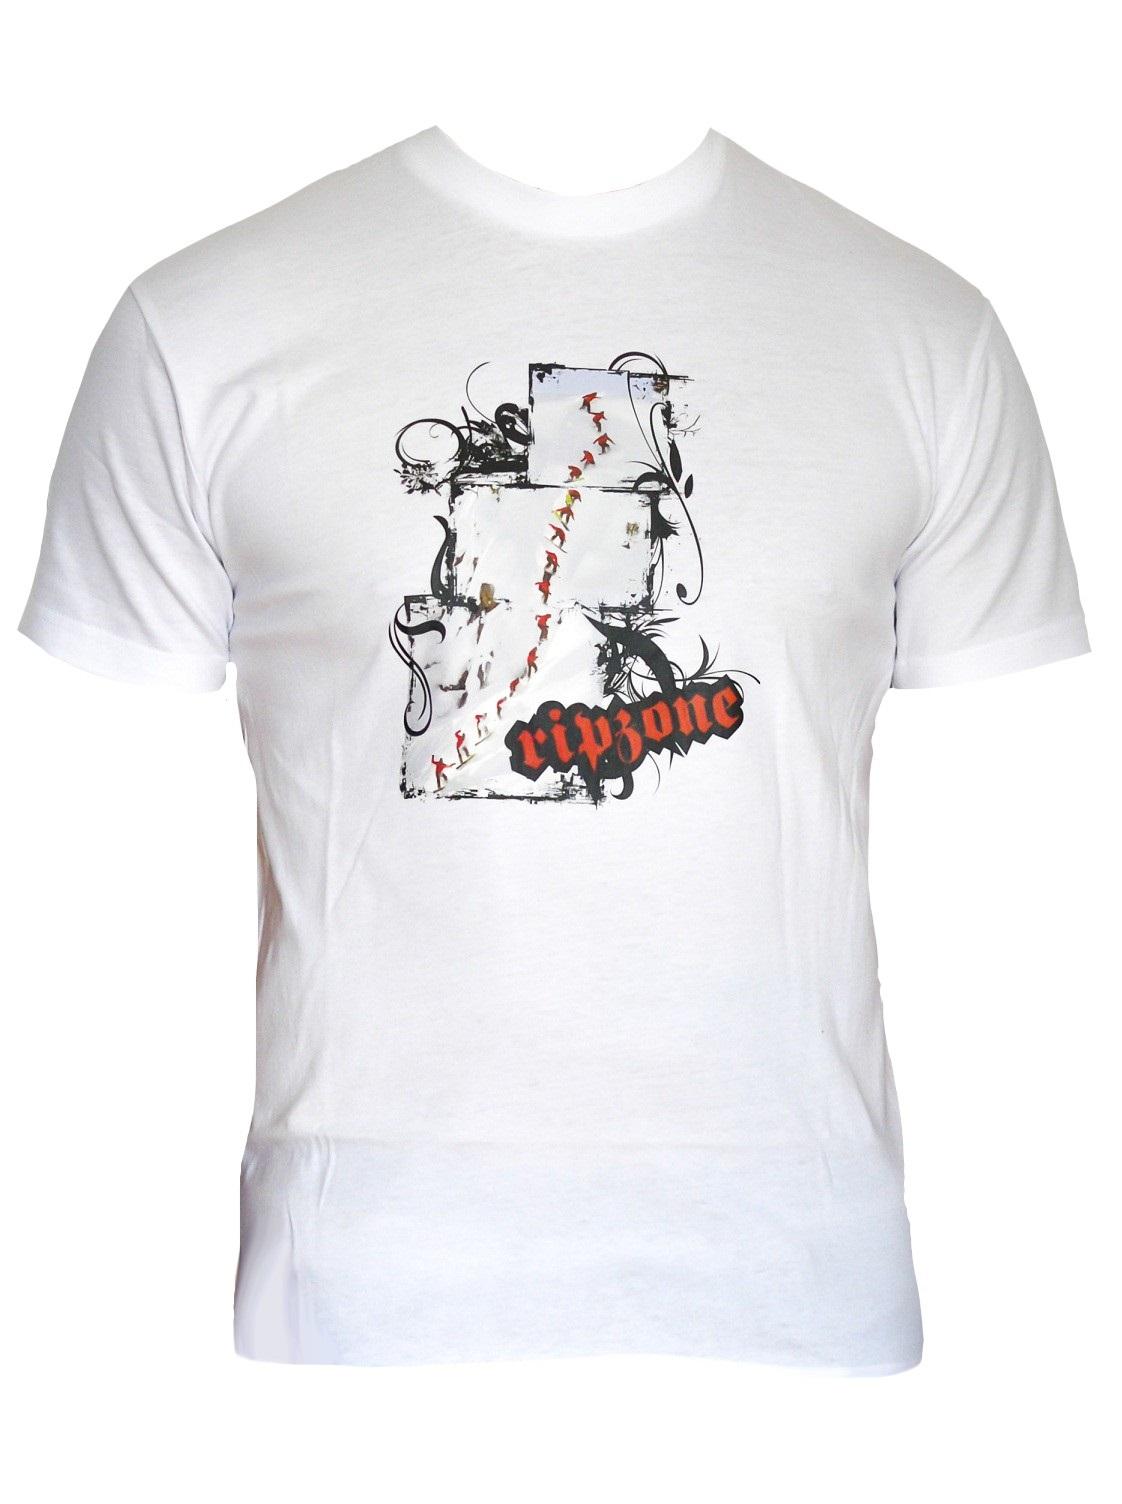 Ripzone tričko Snowboarding white Velikost: M